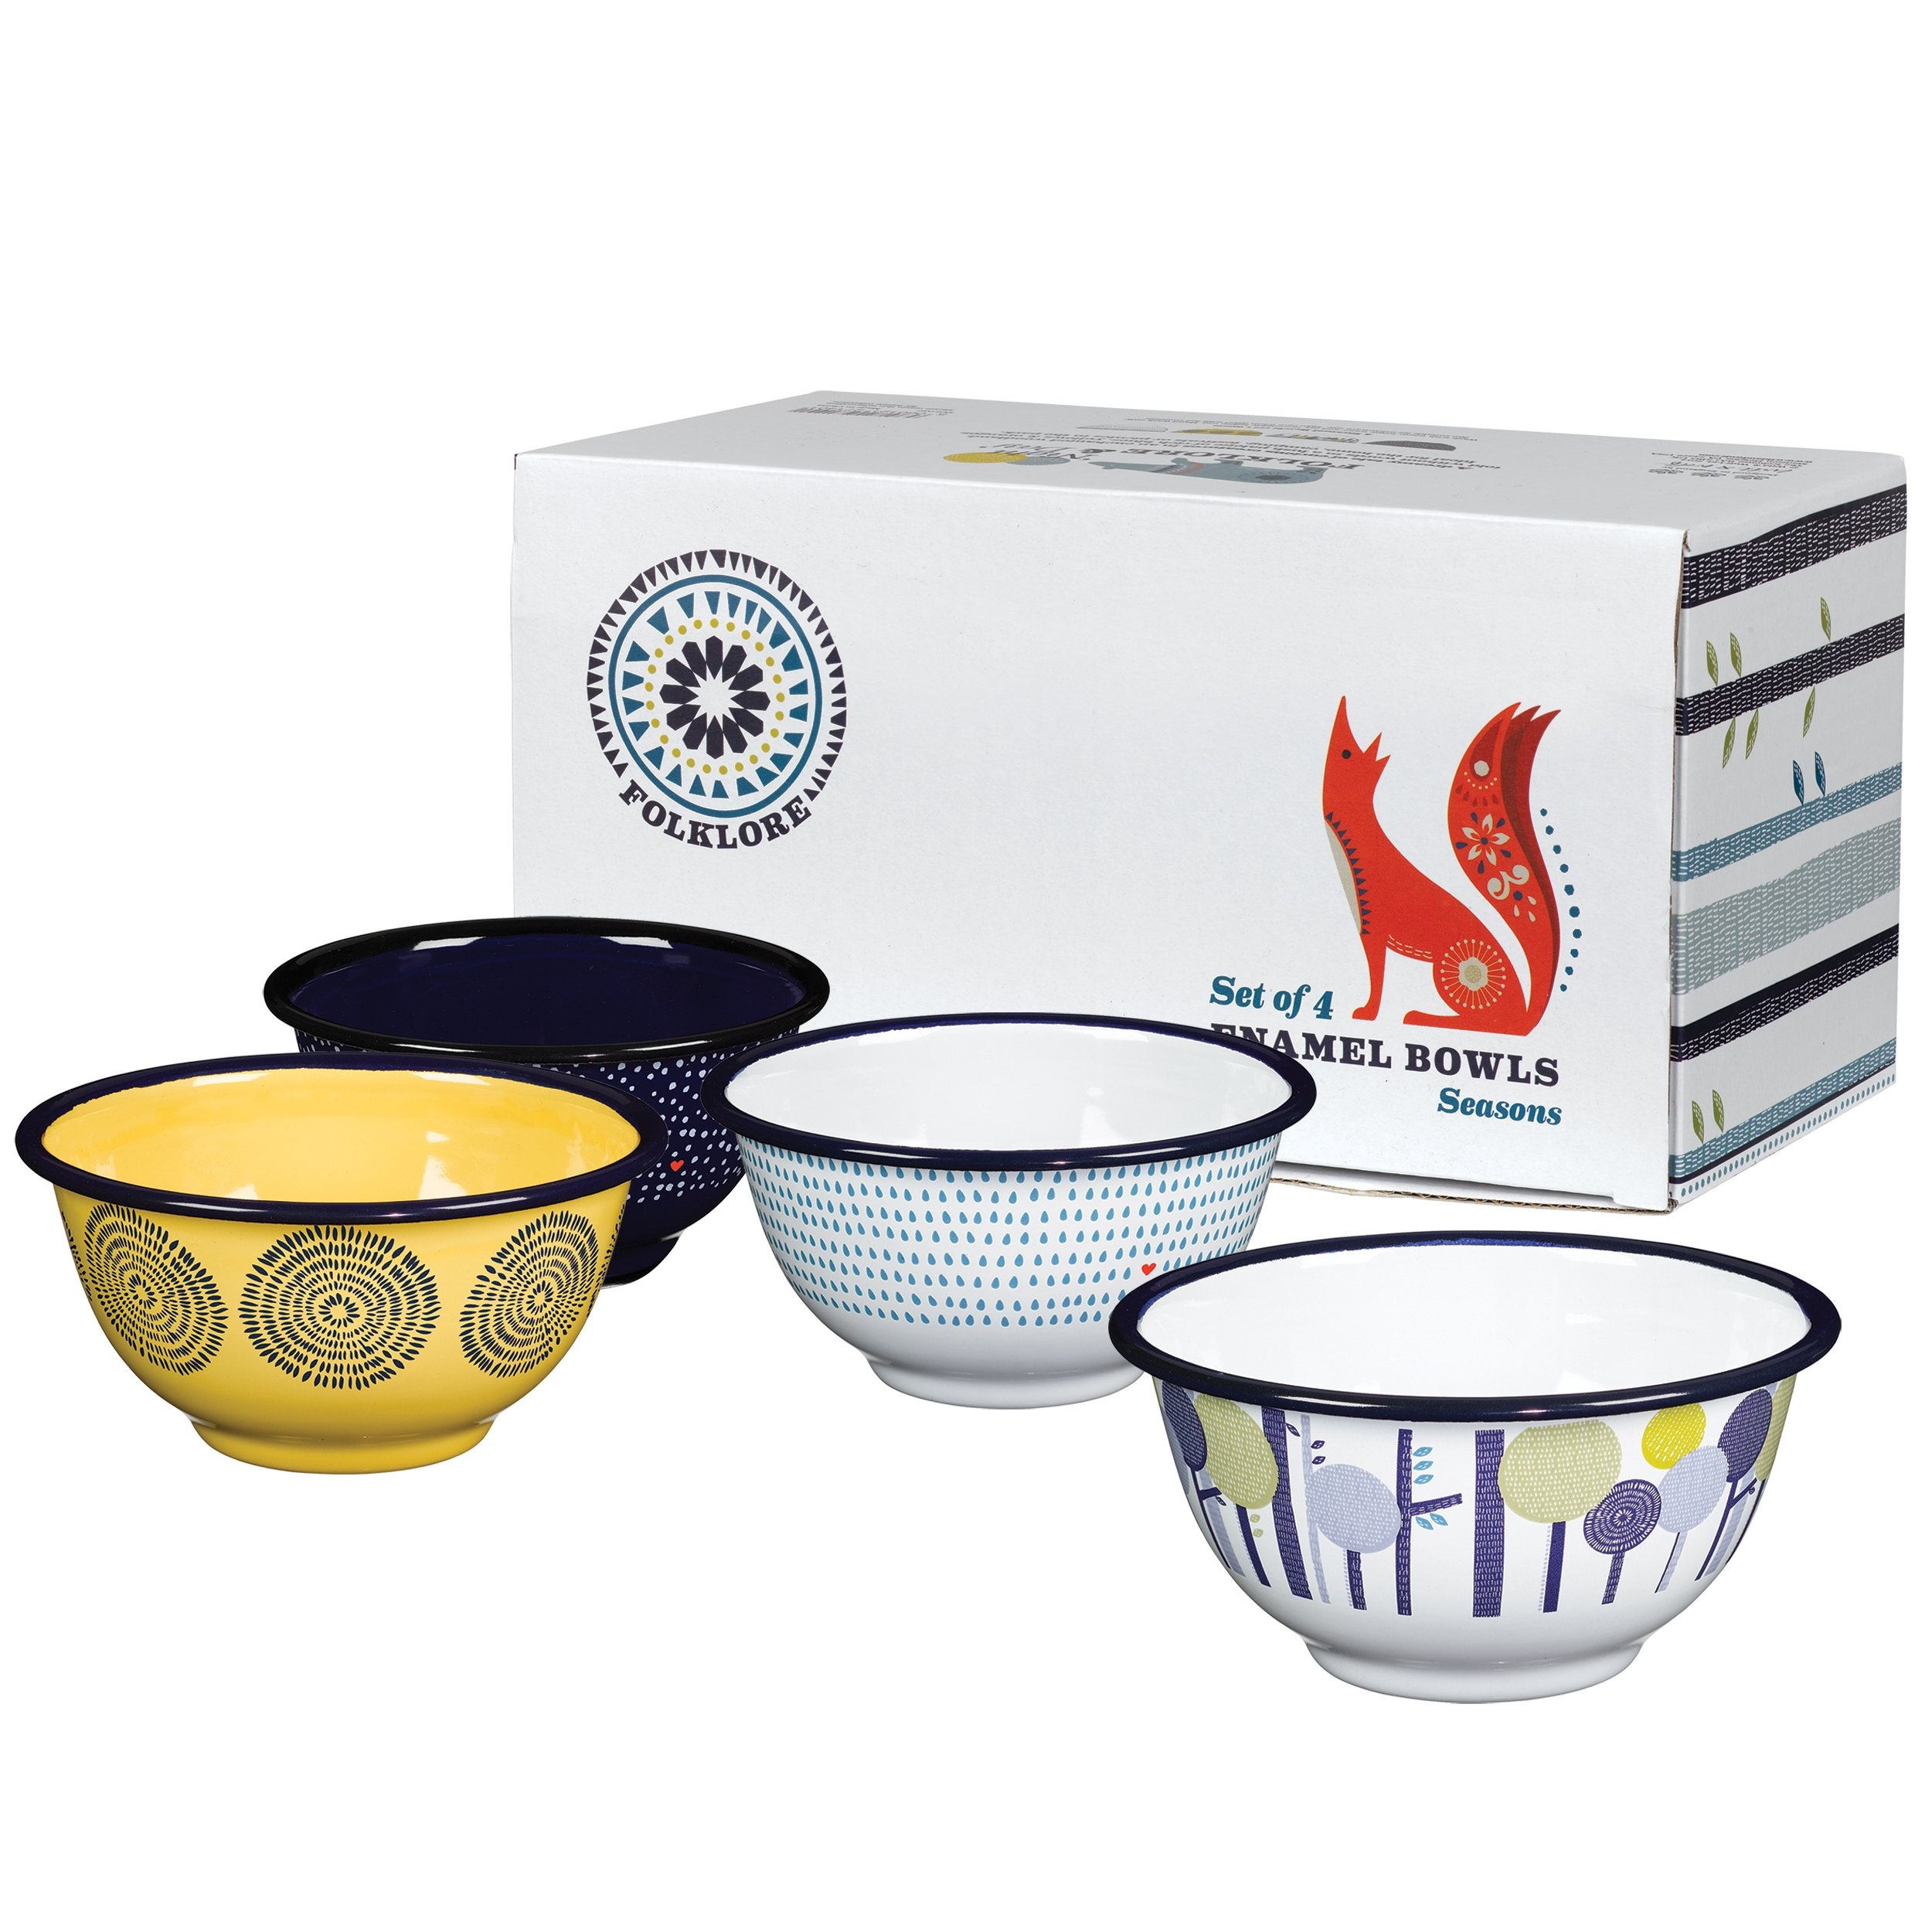 Folklore Enamel Bowls, Seasons Designs (Set of 4) by Folklore (Image #1)